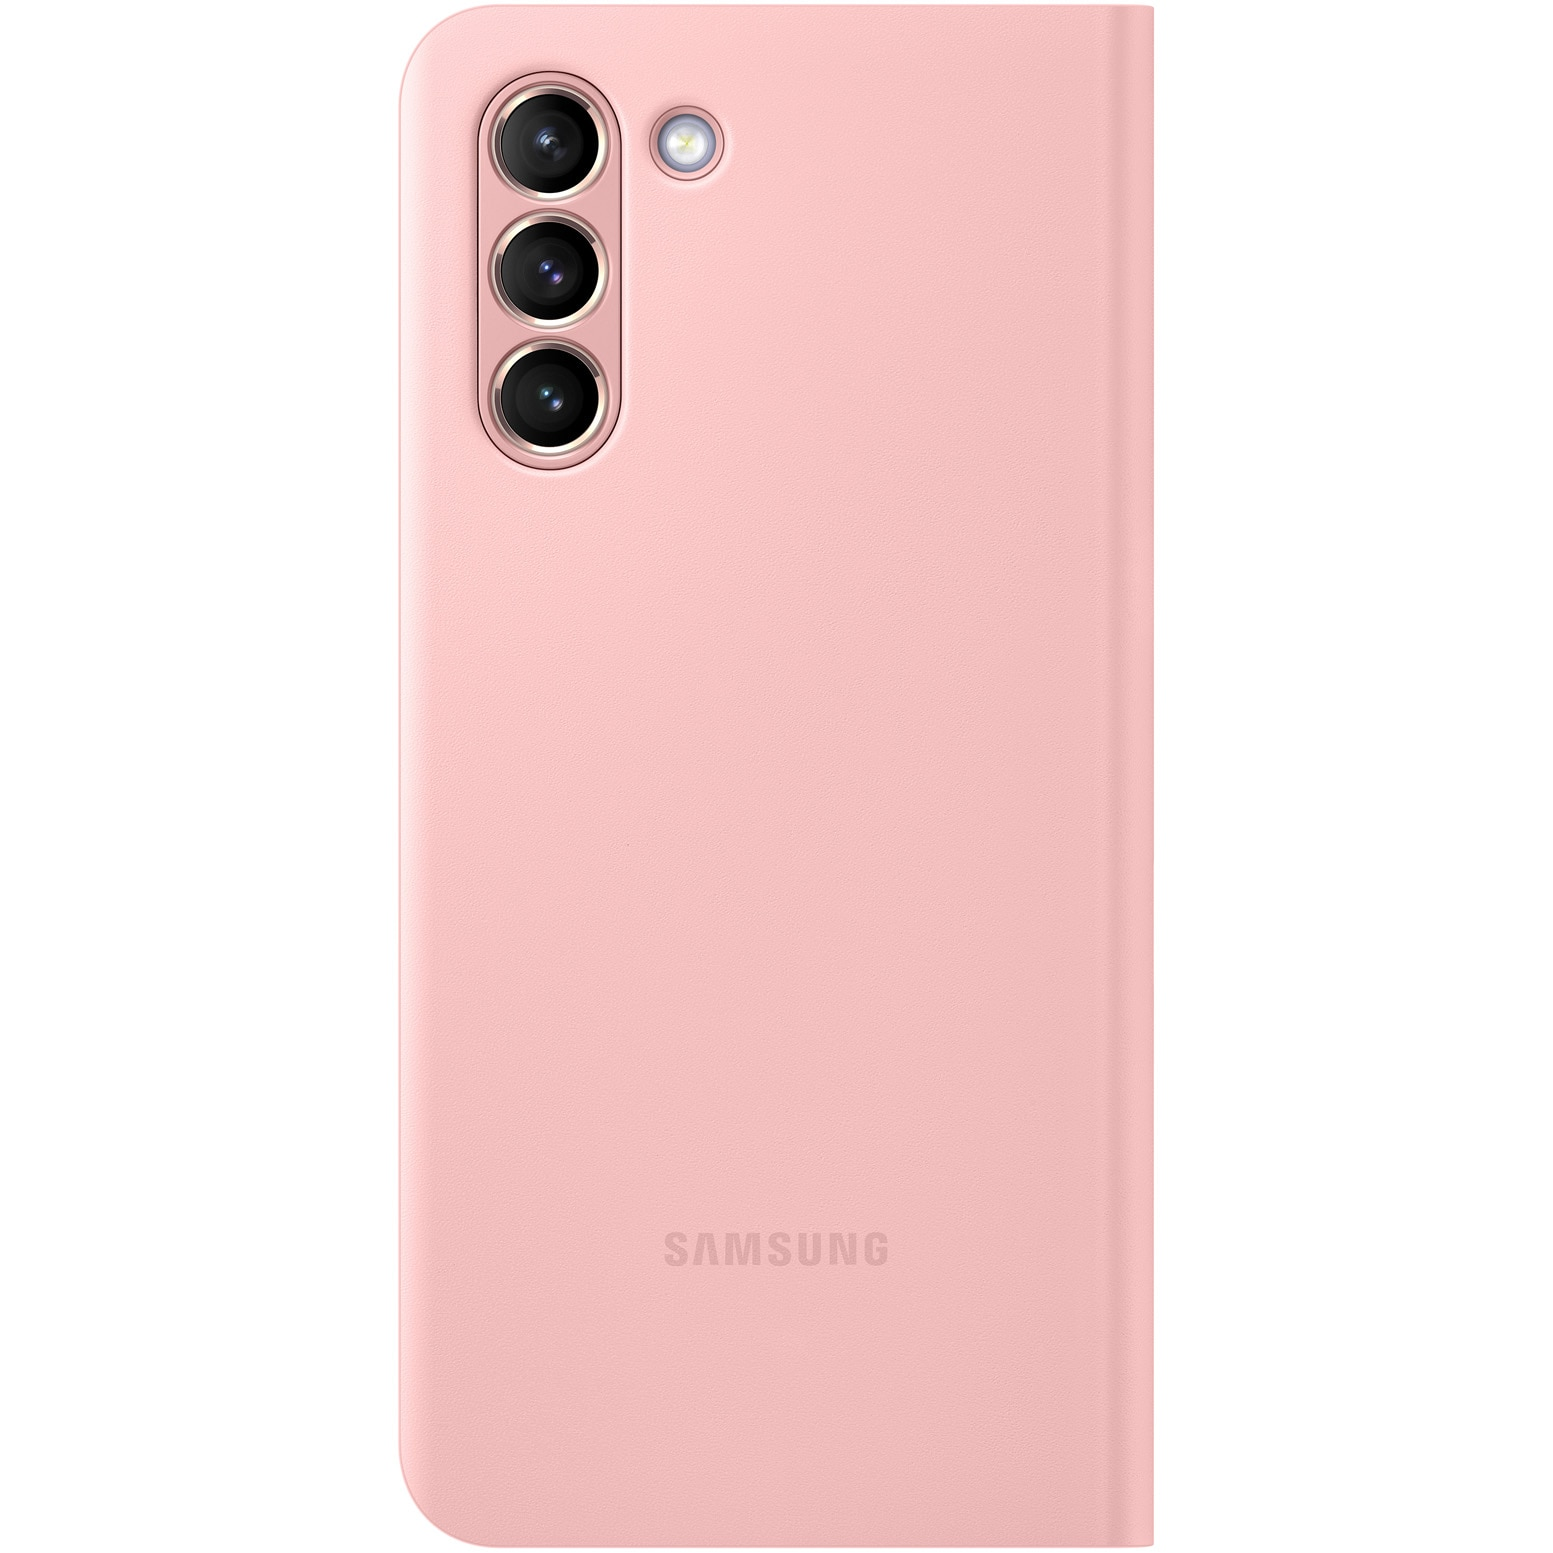 Fotografie Husa de protectie Samsung Smart LED View Cover pentru Galaxy S21, Pink